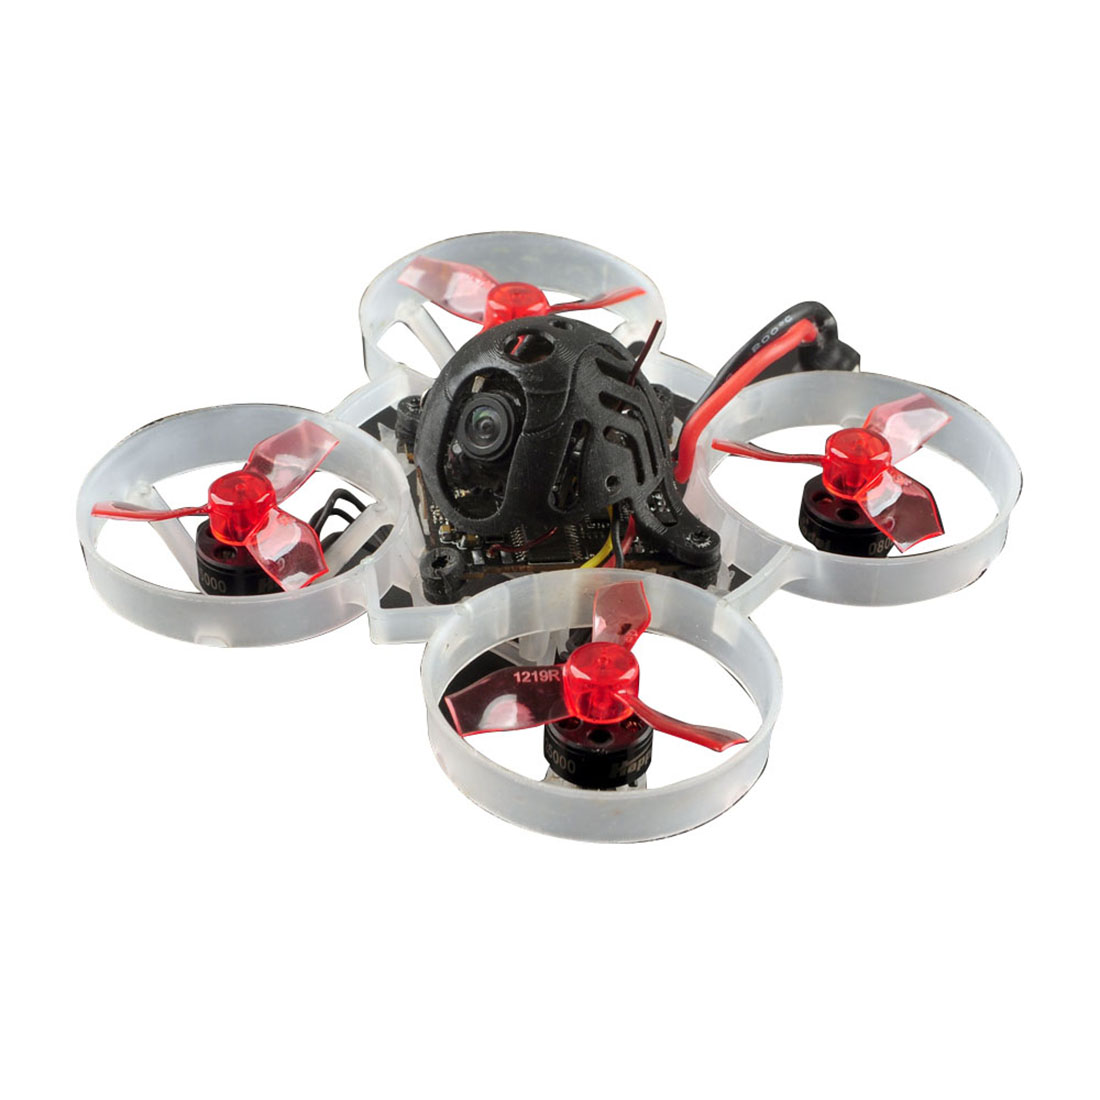 Happymodel Mobula 6  1S 65mm Brushless Bwhoop FPV Drone AIO 4IN1 Crazybee F4 Lite & BETAFPV LiteRadio 2 Radio Remote Controller